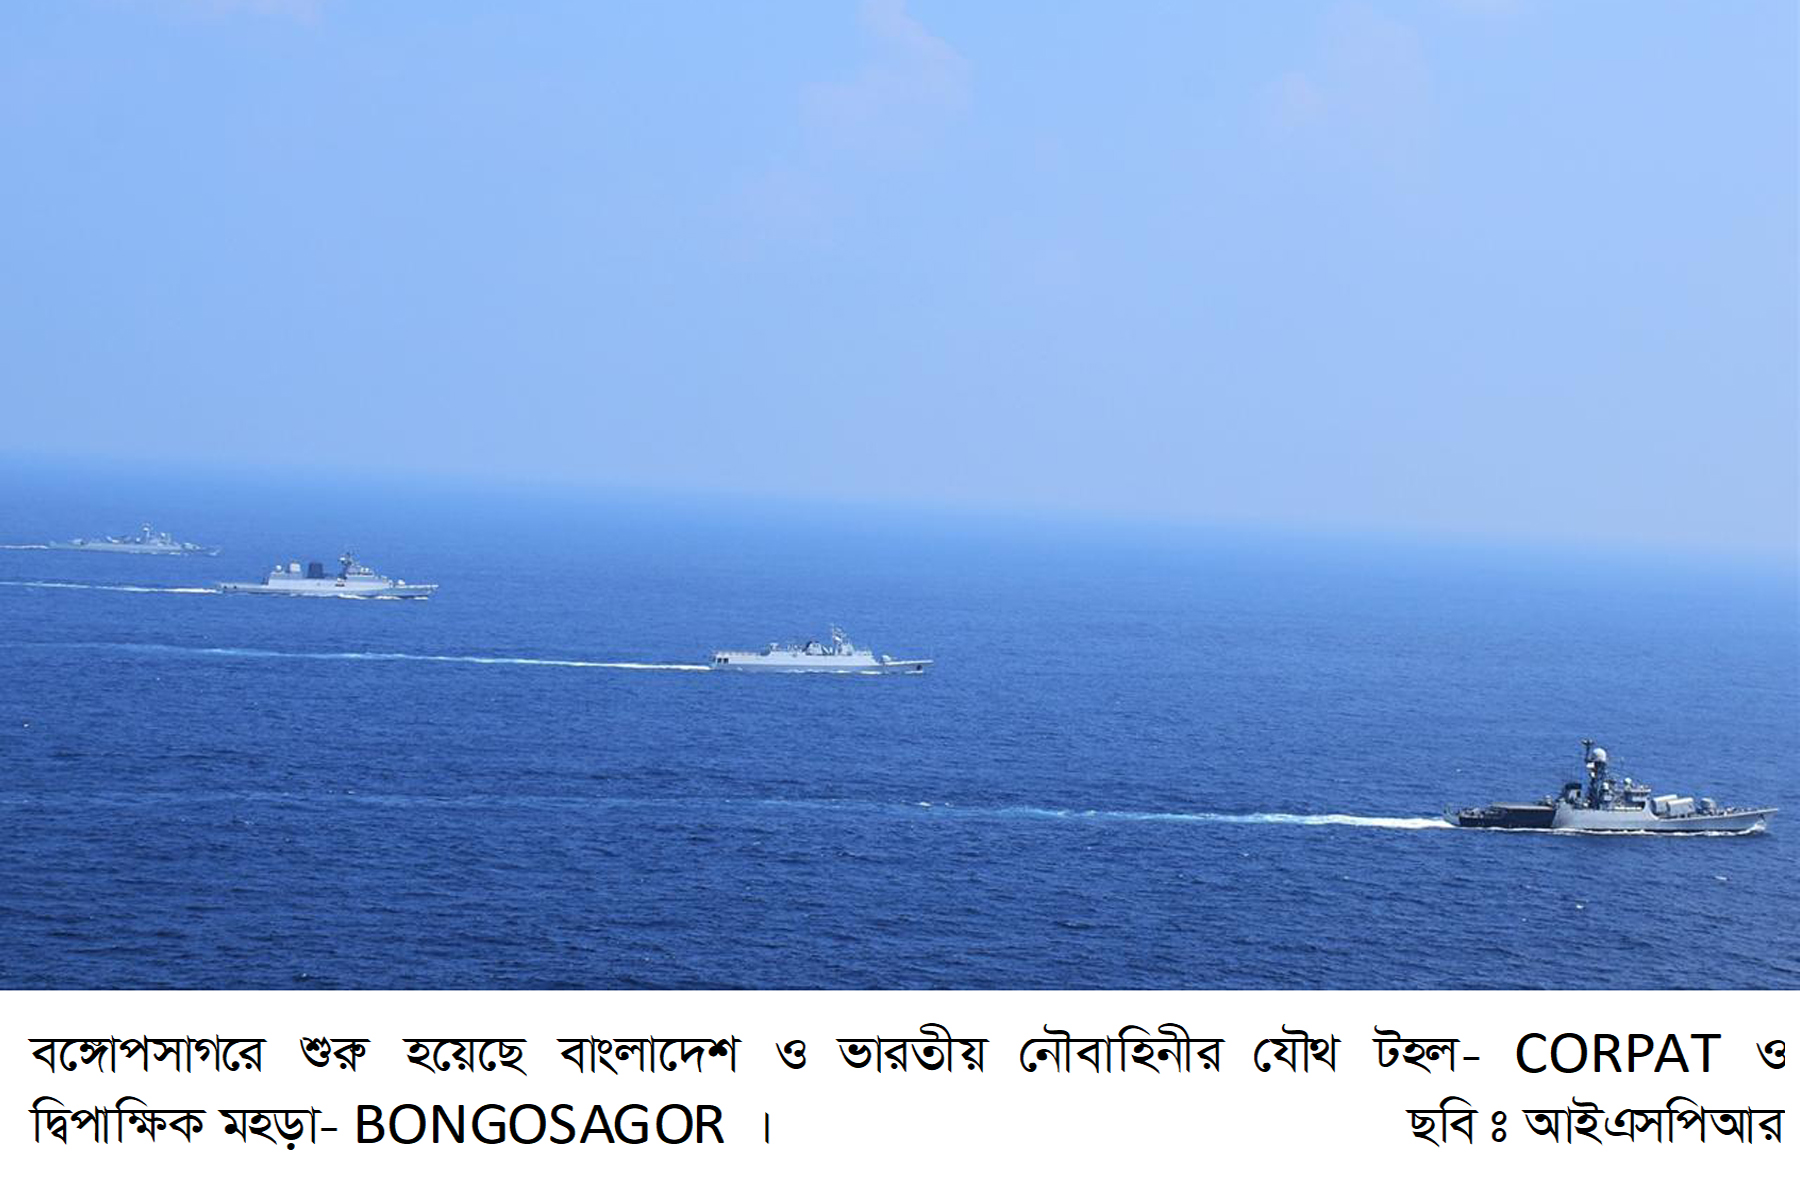 ISPR Navy - 03-10-2020 (2)